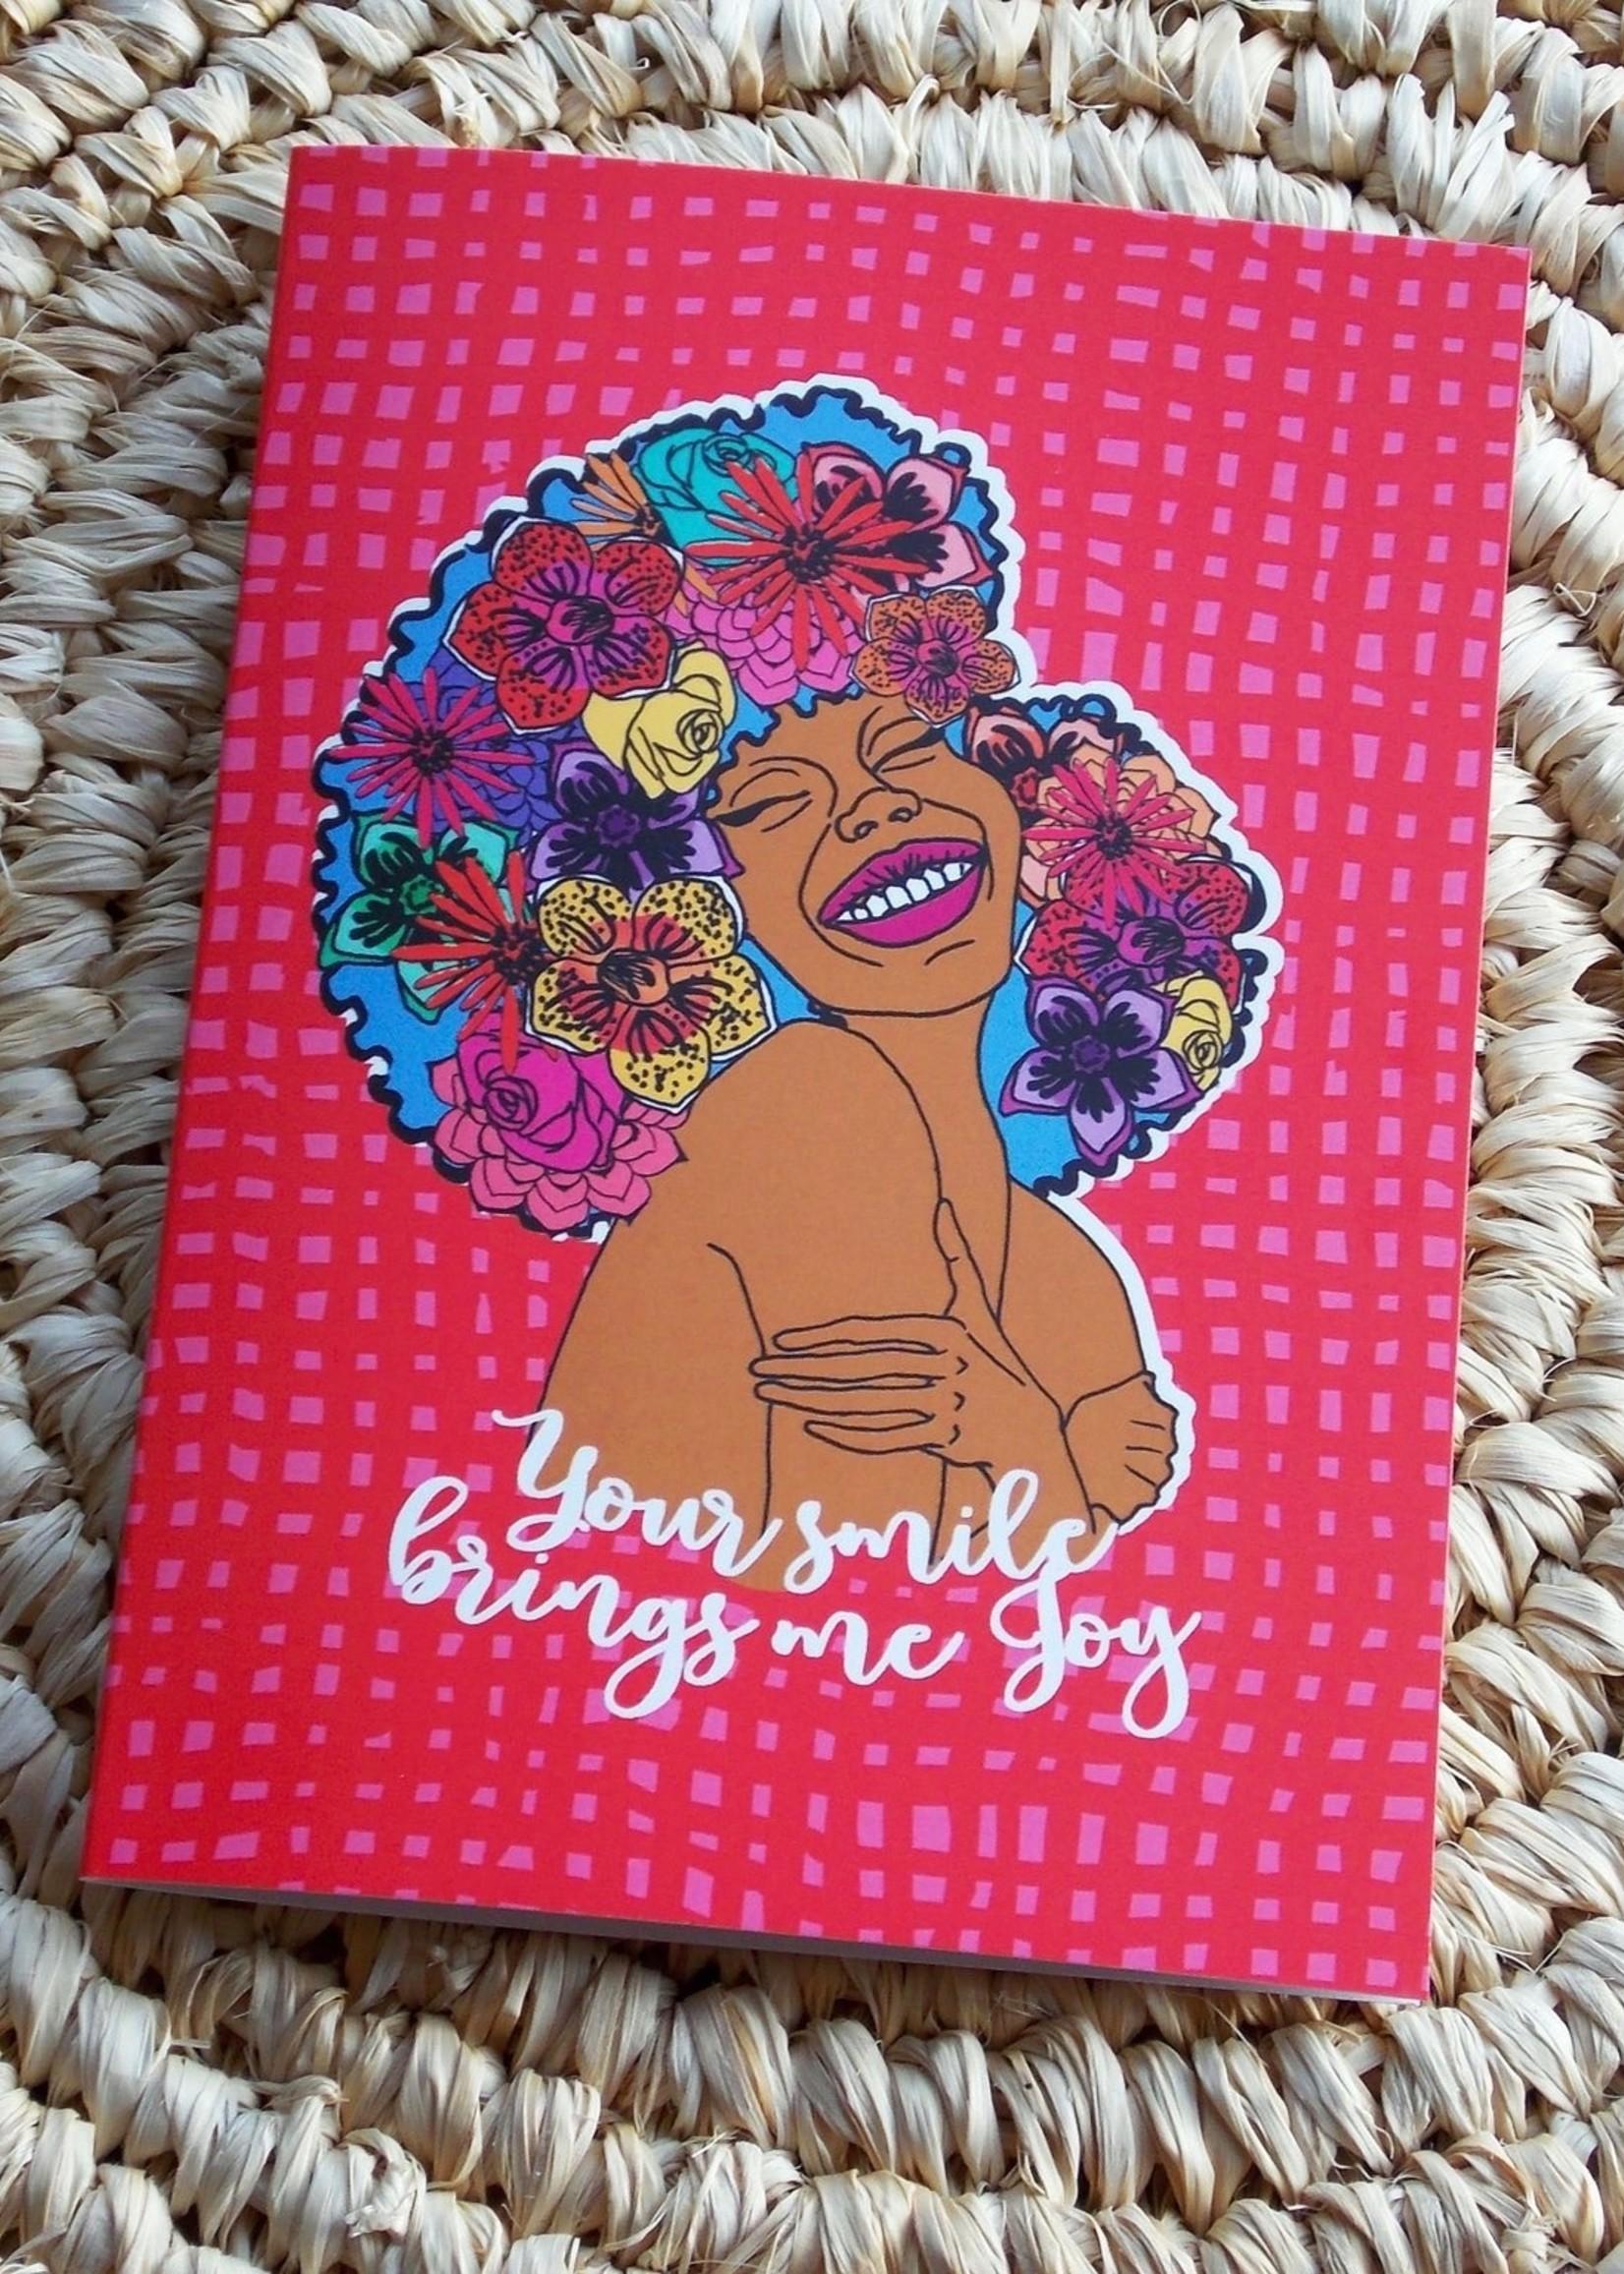 Dorcas Creates Greeting Cards by Dorcas